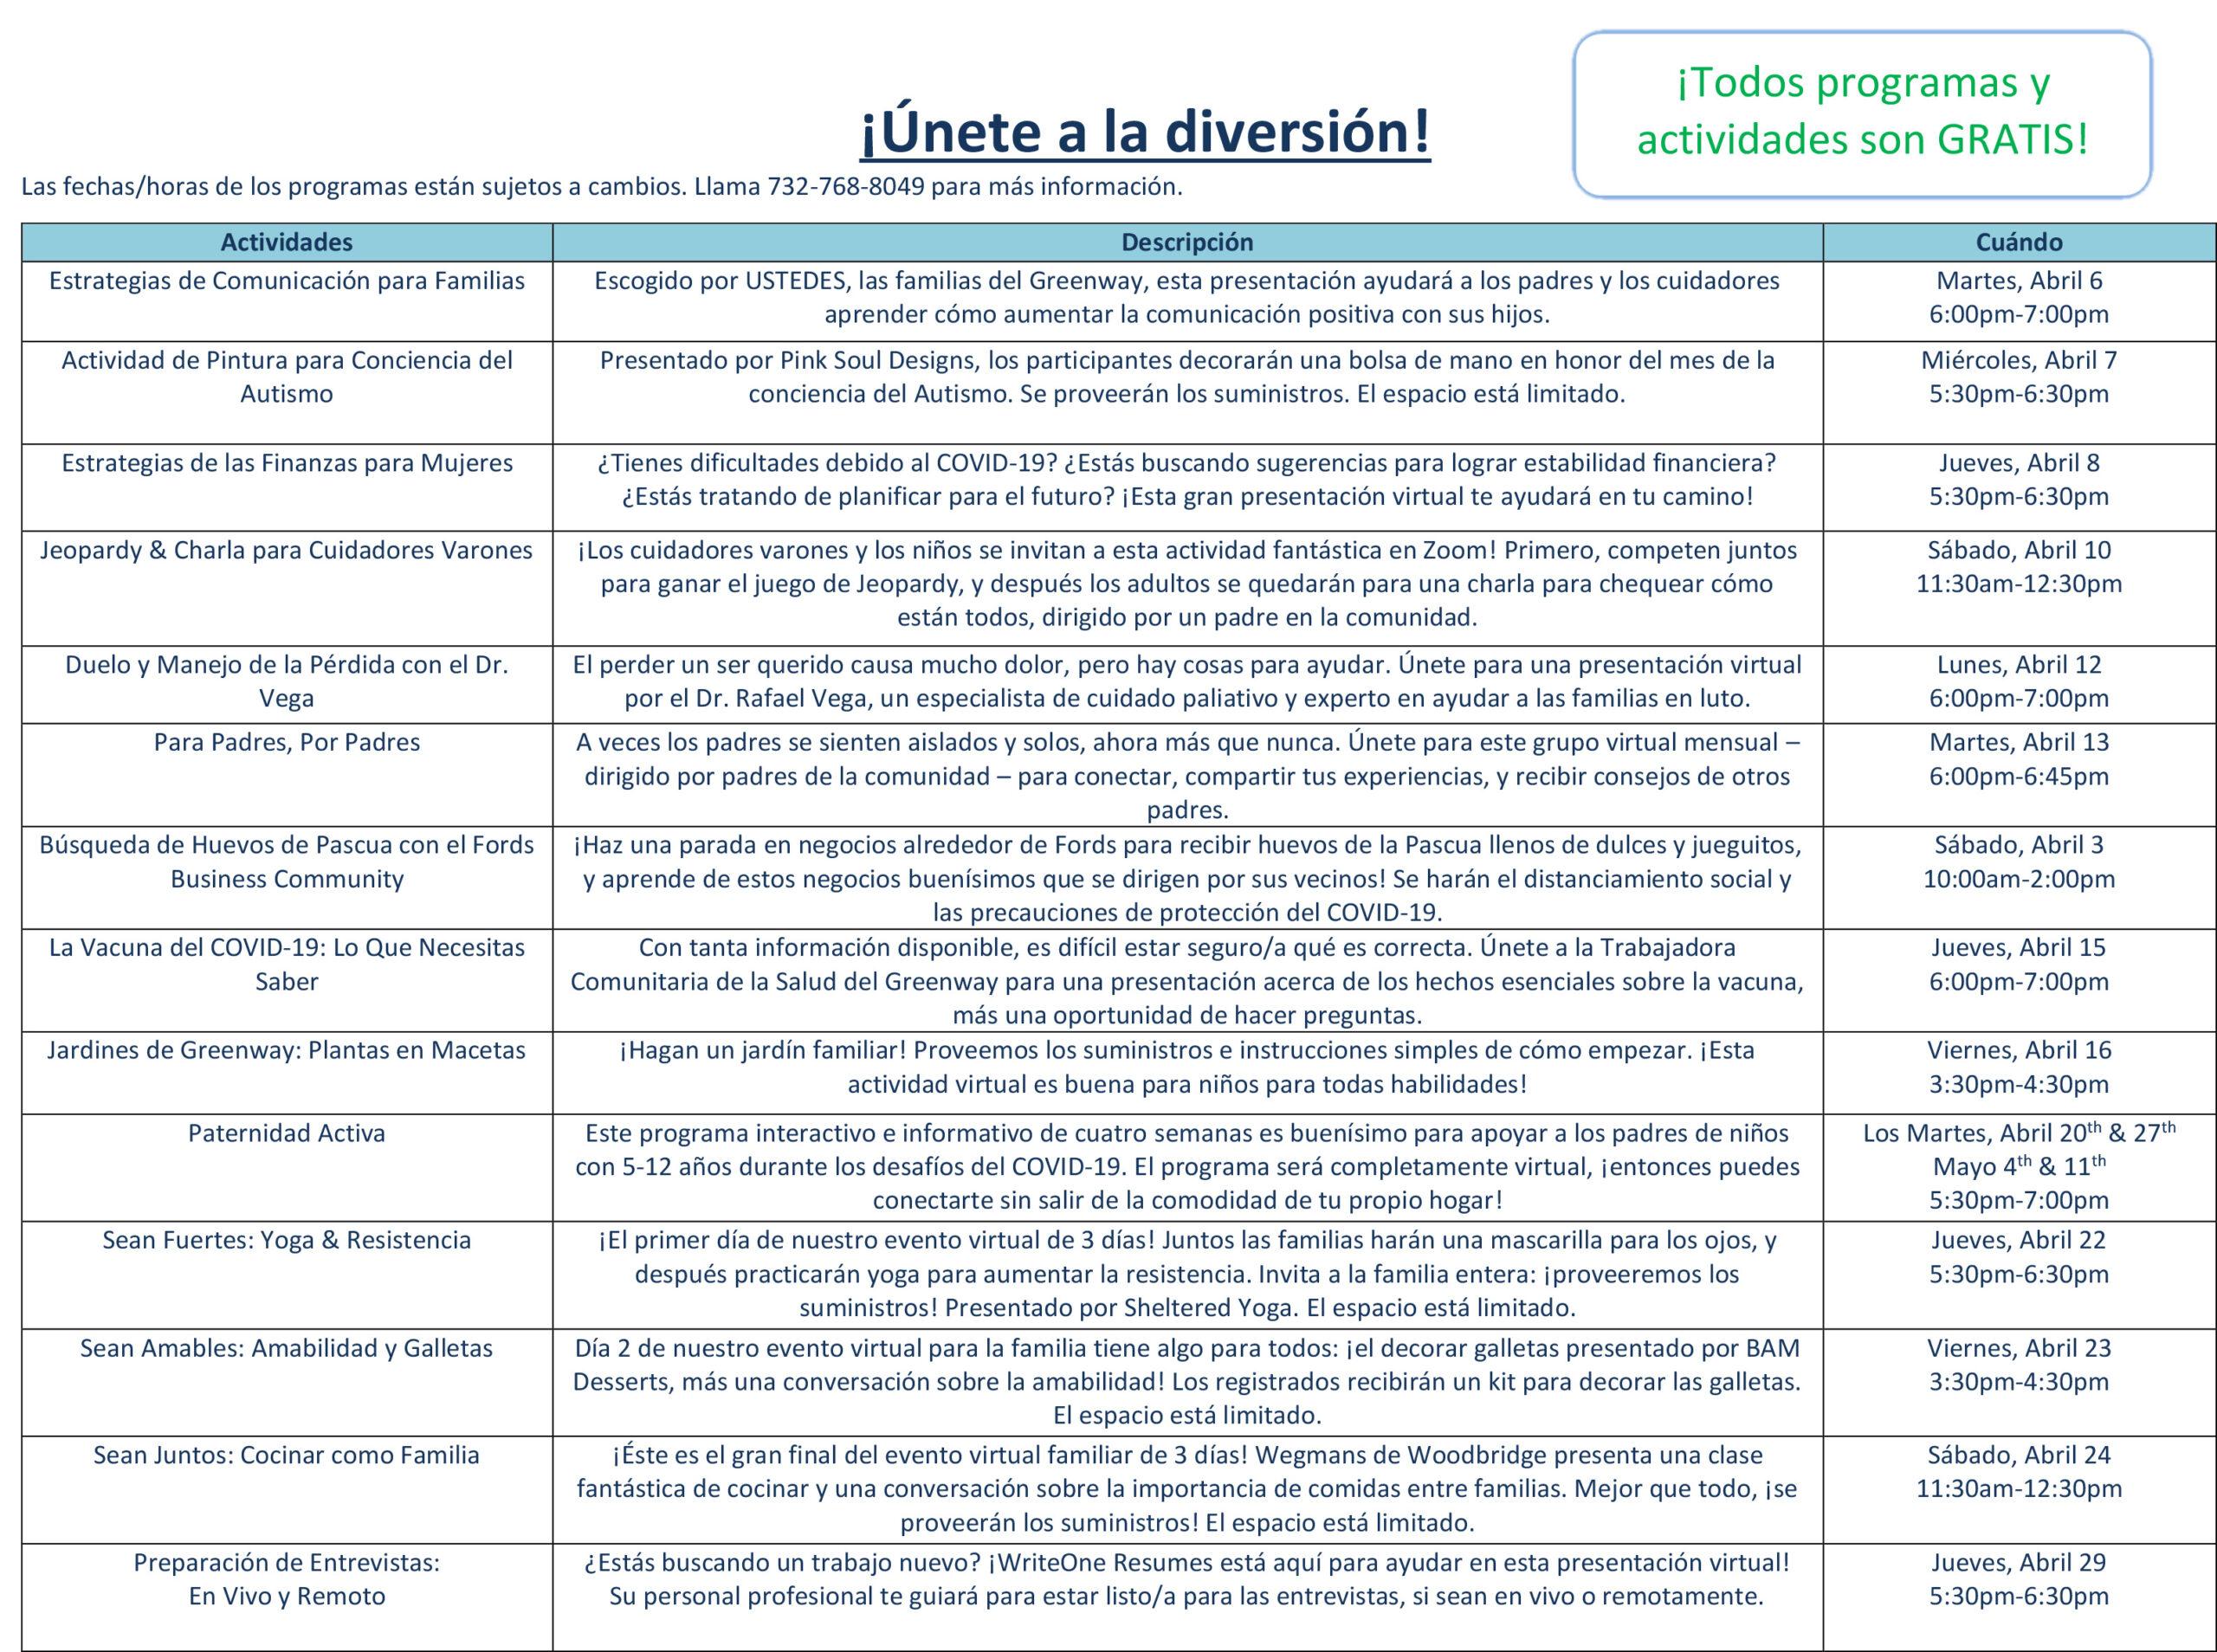 Greenway FSC Calendar April 2021 Spanish 2